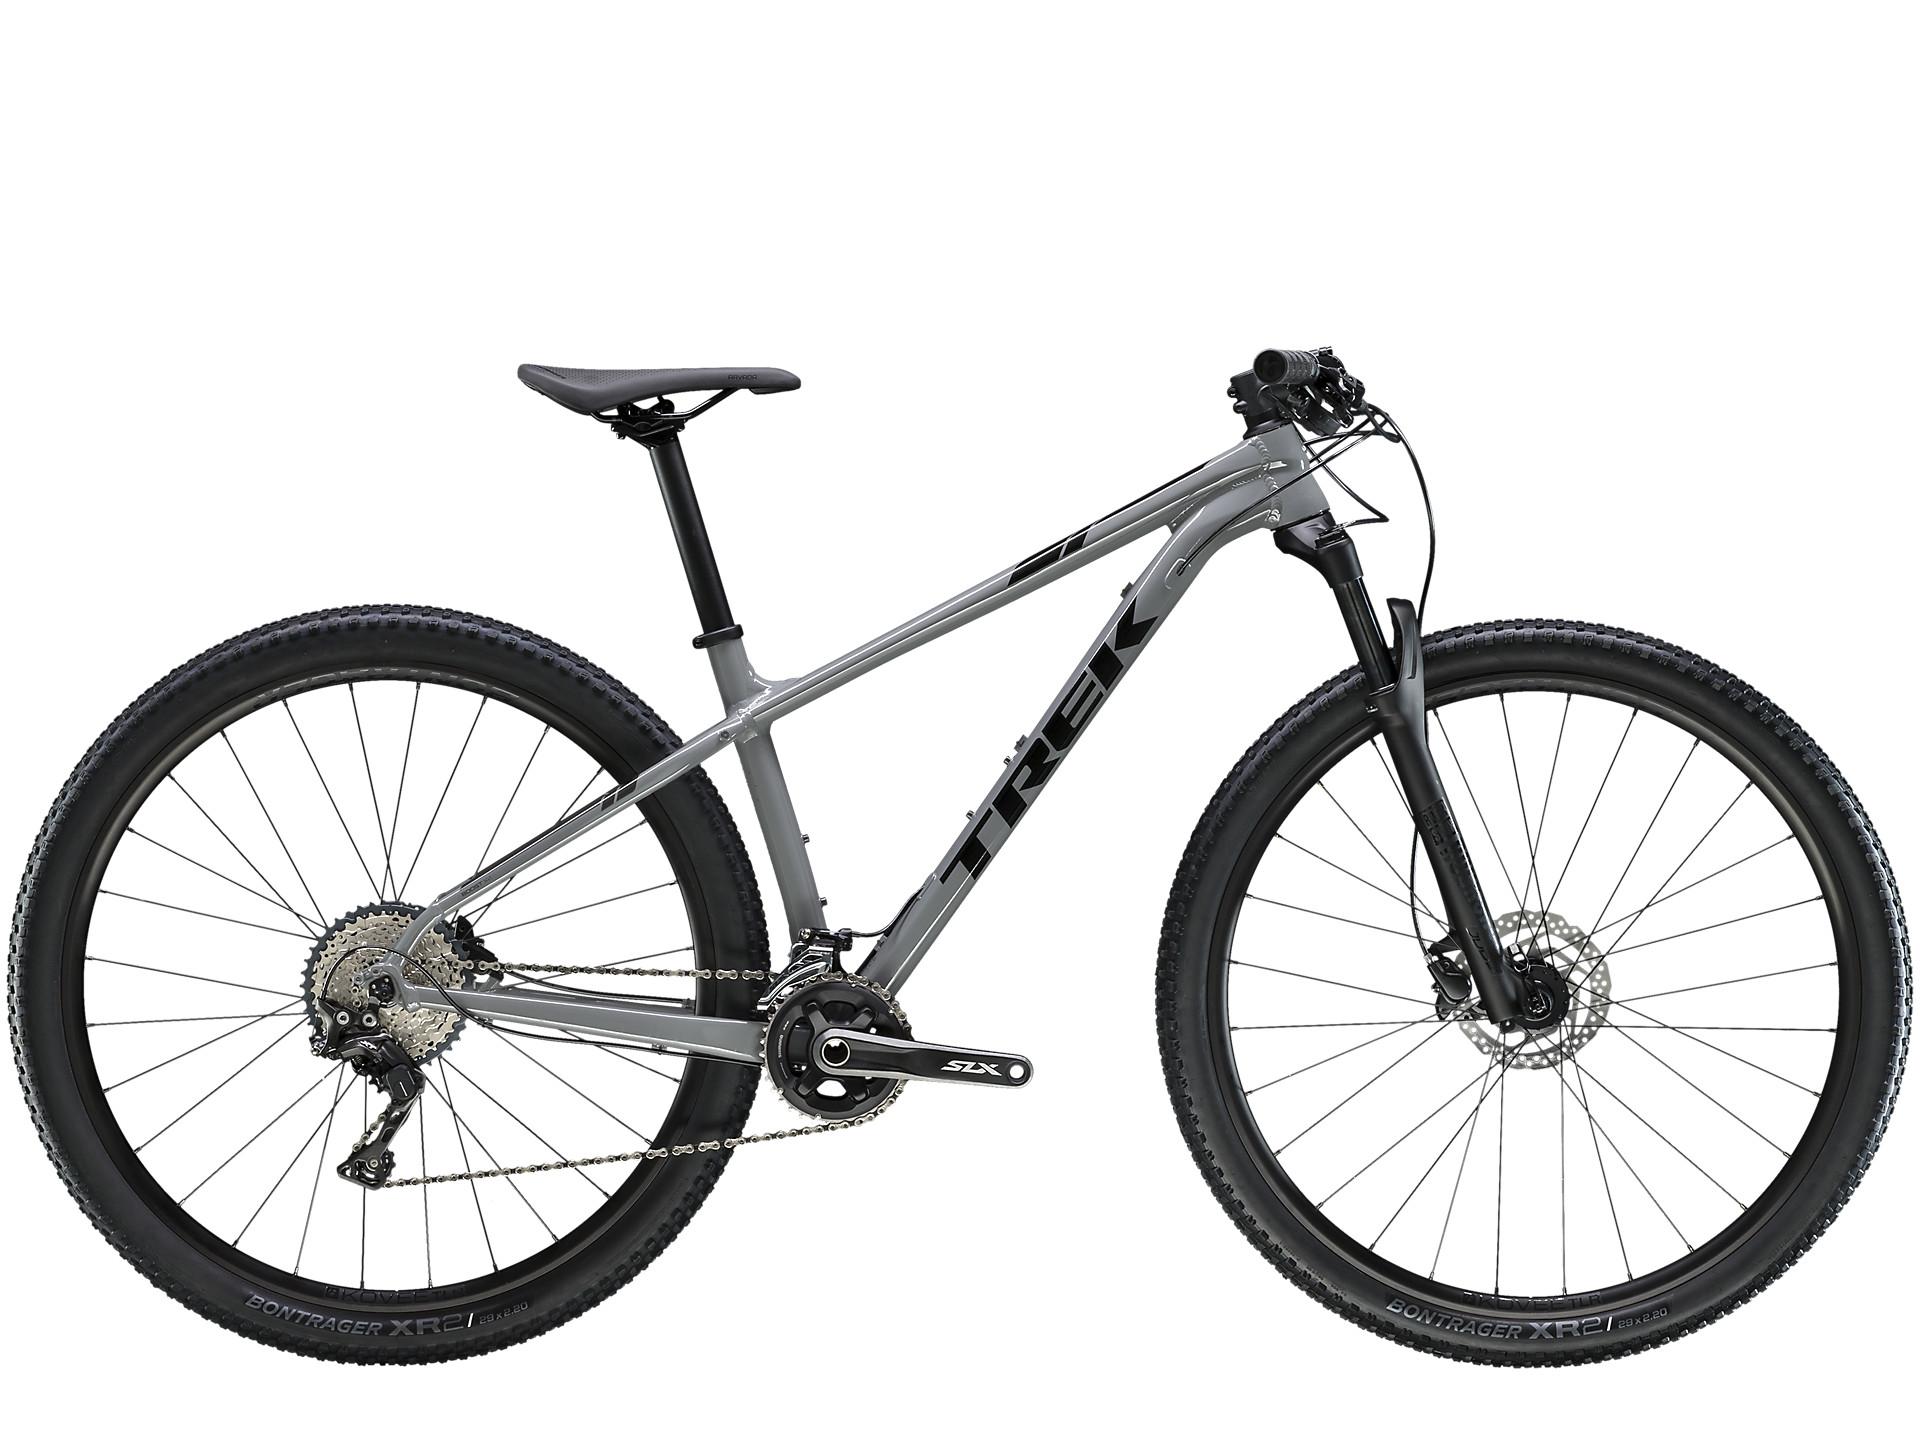 59b9daf9ad4 X-Caliber 7 | Trek Bikes